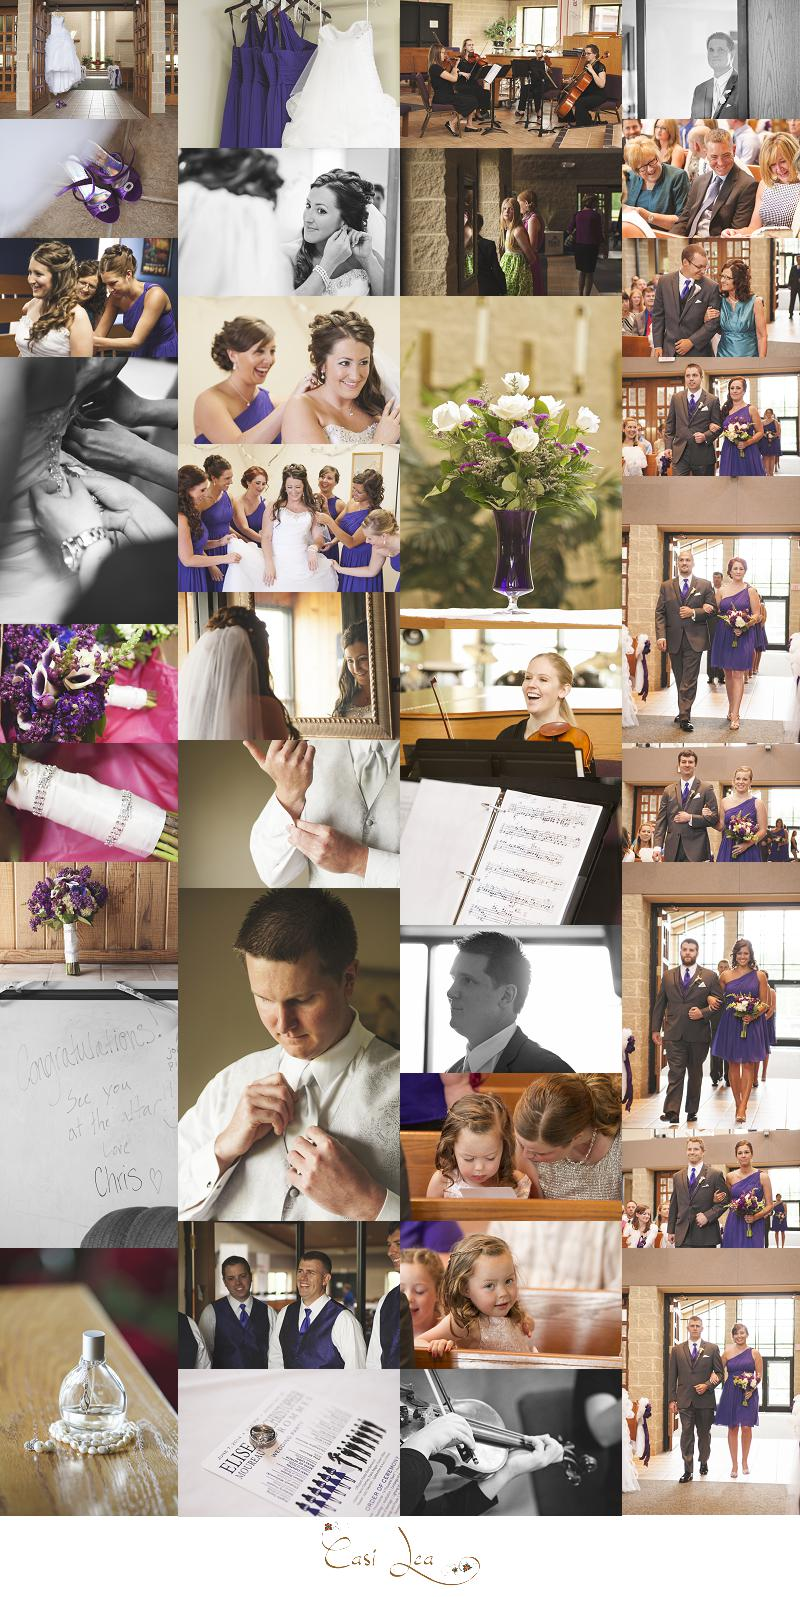 by Green Bay wedding photographer Casi Lark of Casi Lea Photography www.CasiLea-Photography.com